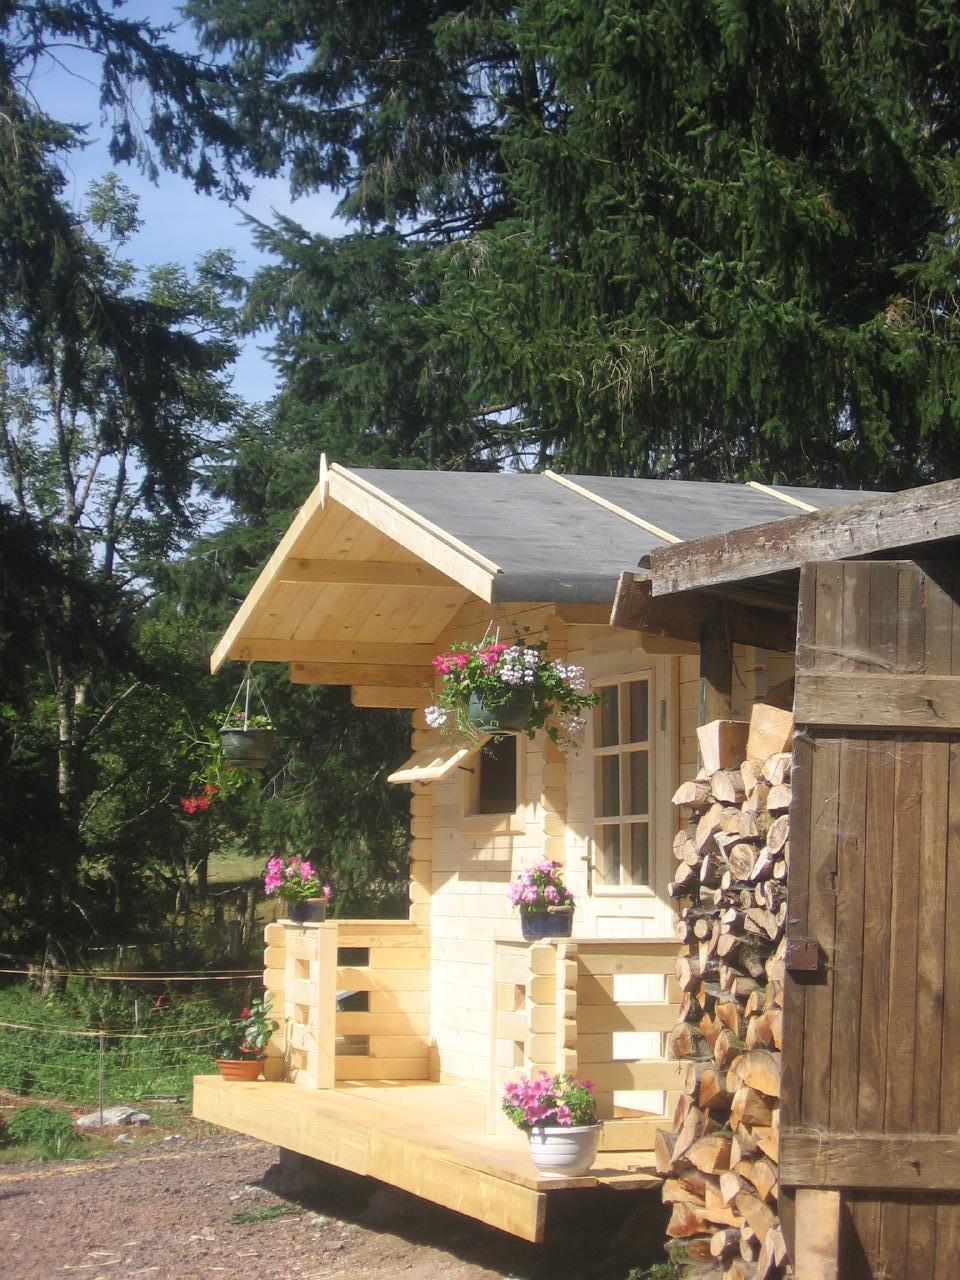 Ferienhaus Steinhäuschen Shila, im Naturparc der Vogesen,  mit Saunahaus (1717460), La Rosière, Haute-Saône, Franche-Comté, Frankreich, Bild 19